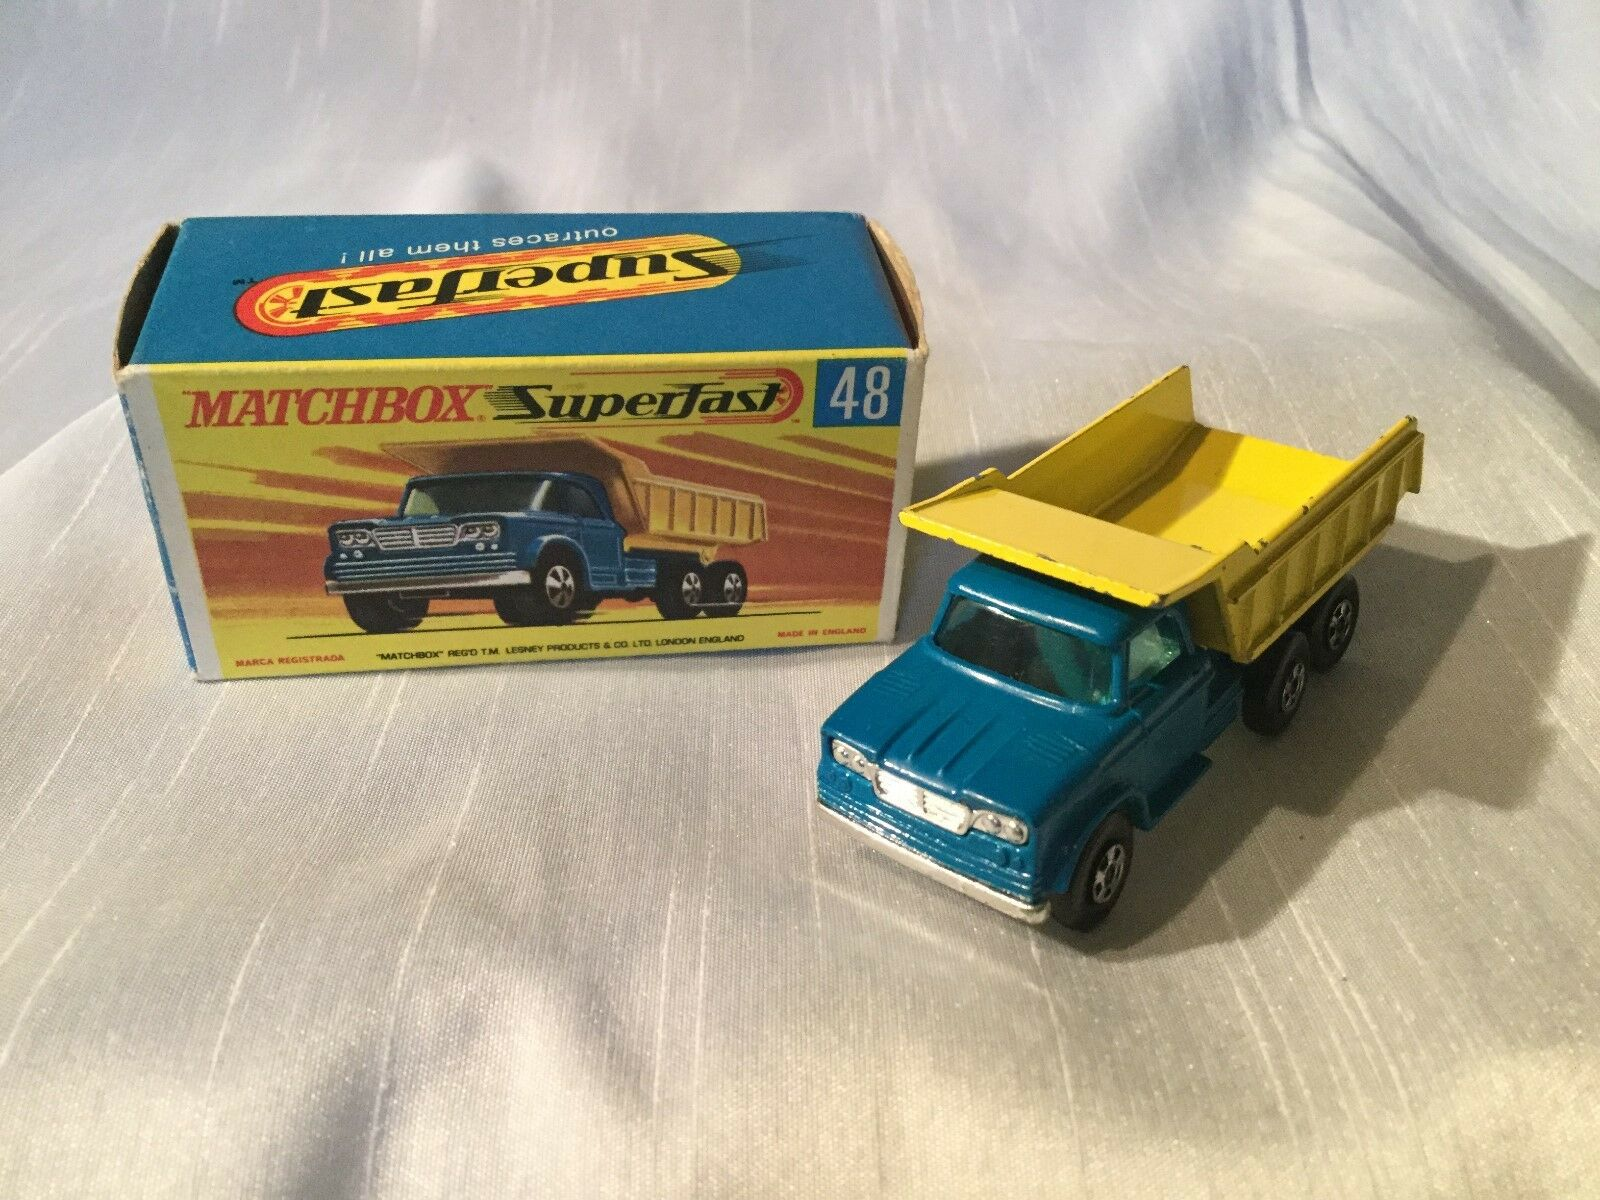 venta Matchbox Matchbox Matchbox Lesney súperfast Nº 48 Dodge Volquete Camión En Caja  tienda en linea